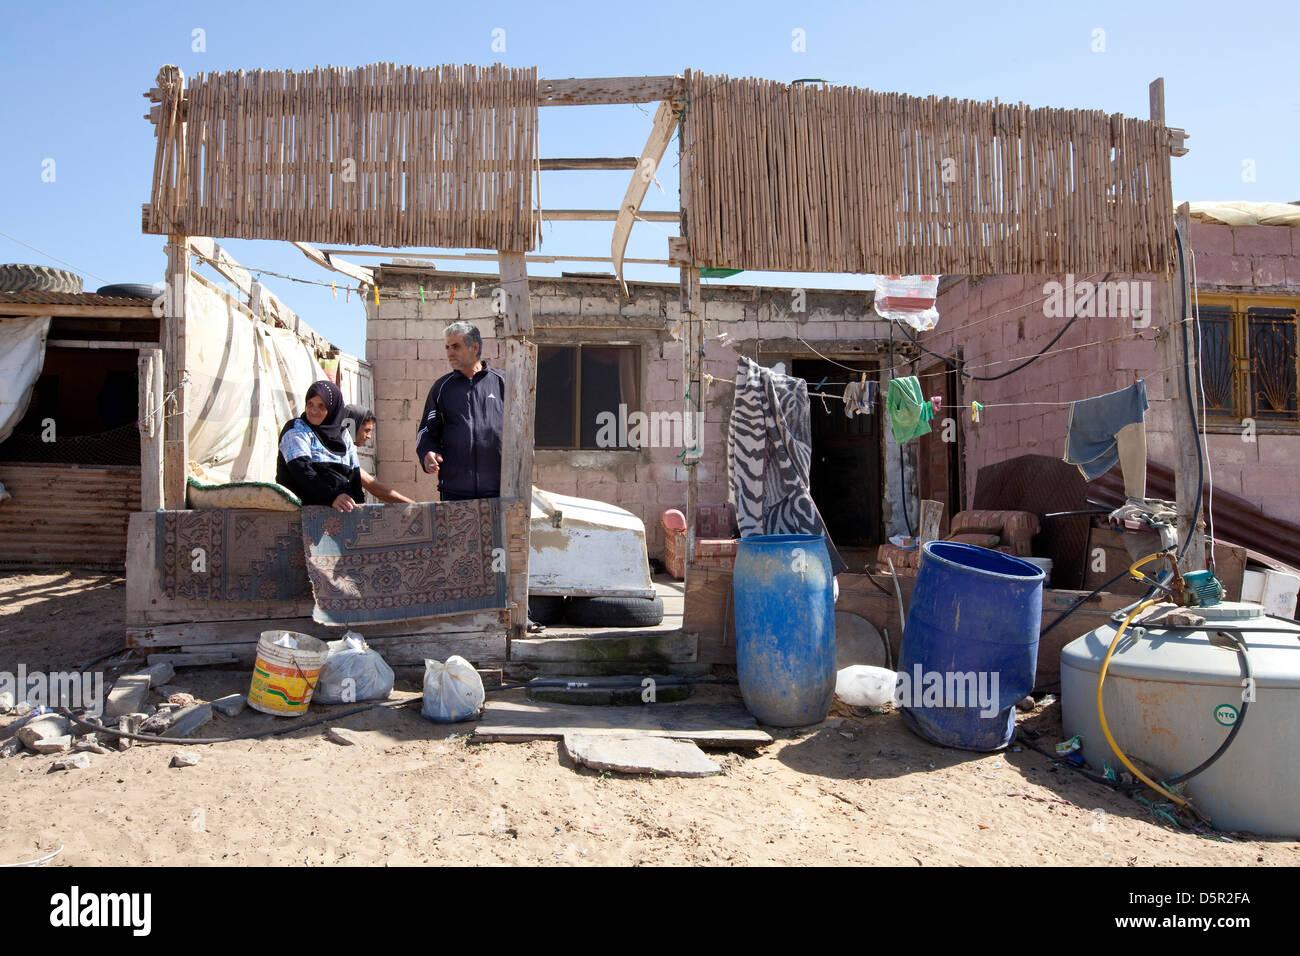 Jal El Bahr rifugiato palestinese insediamento, Tyr, Libano Immagini Stock